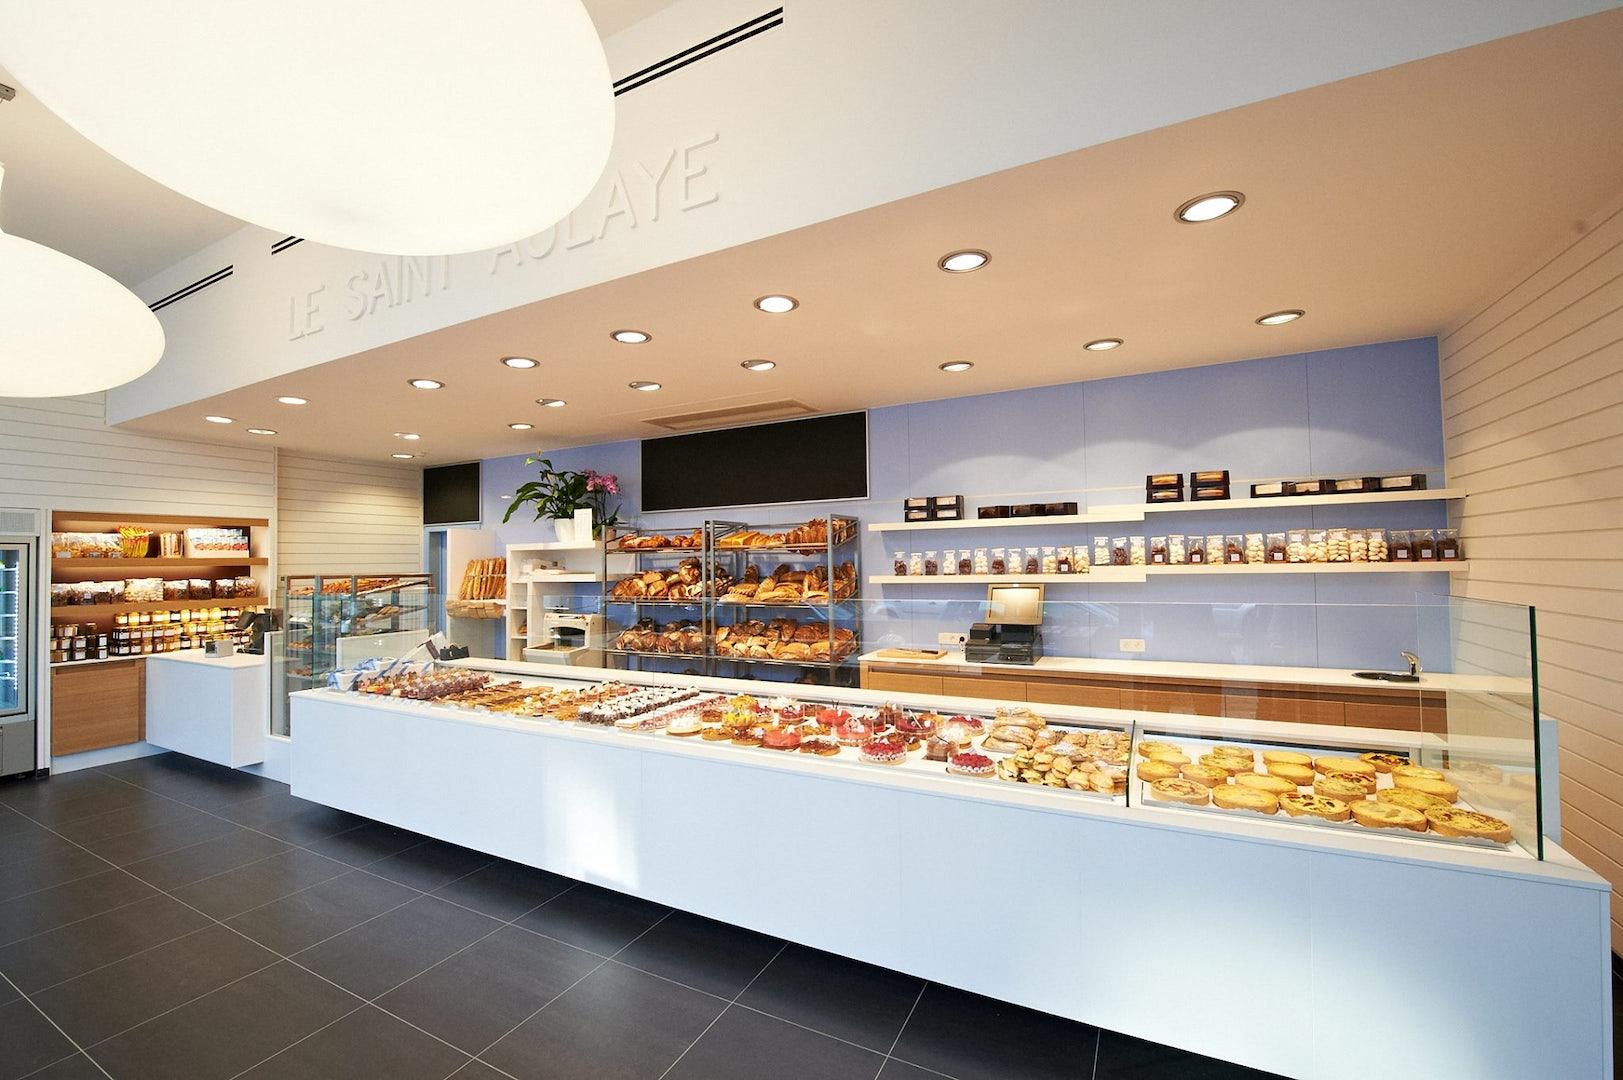 Le Saint-Aulaye bakery